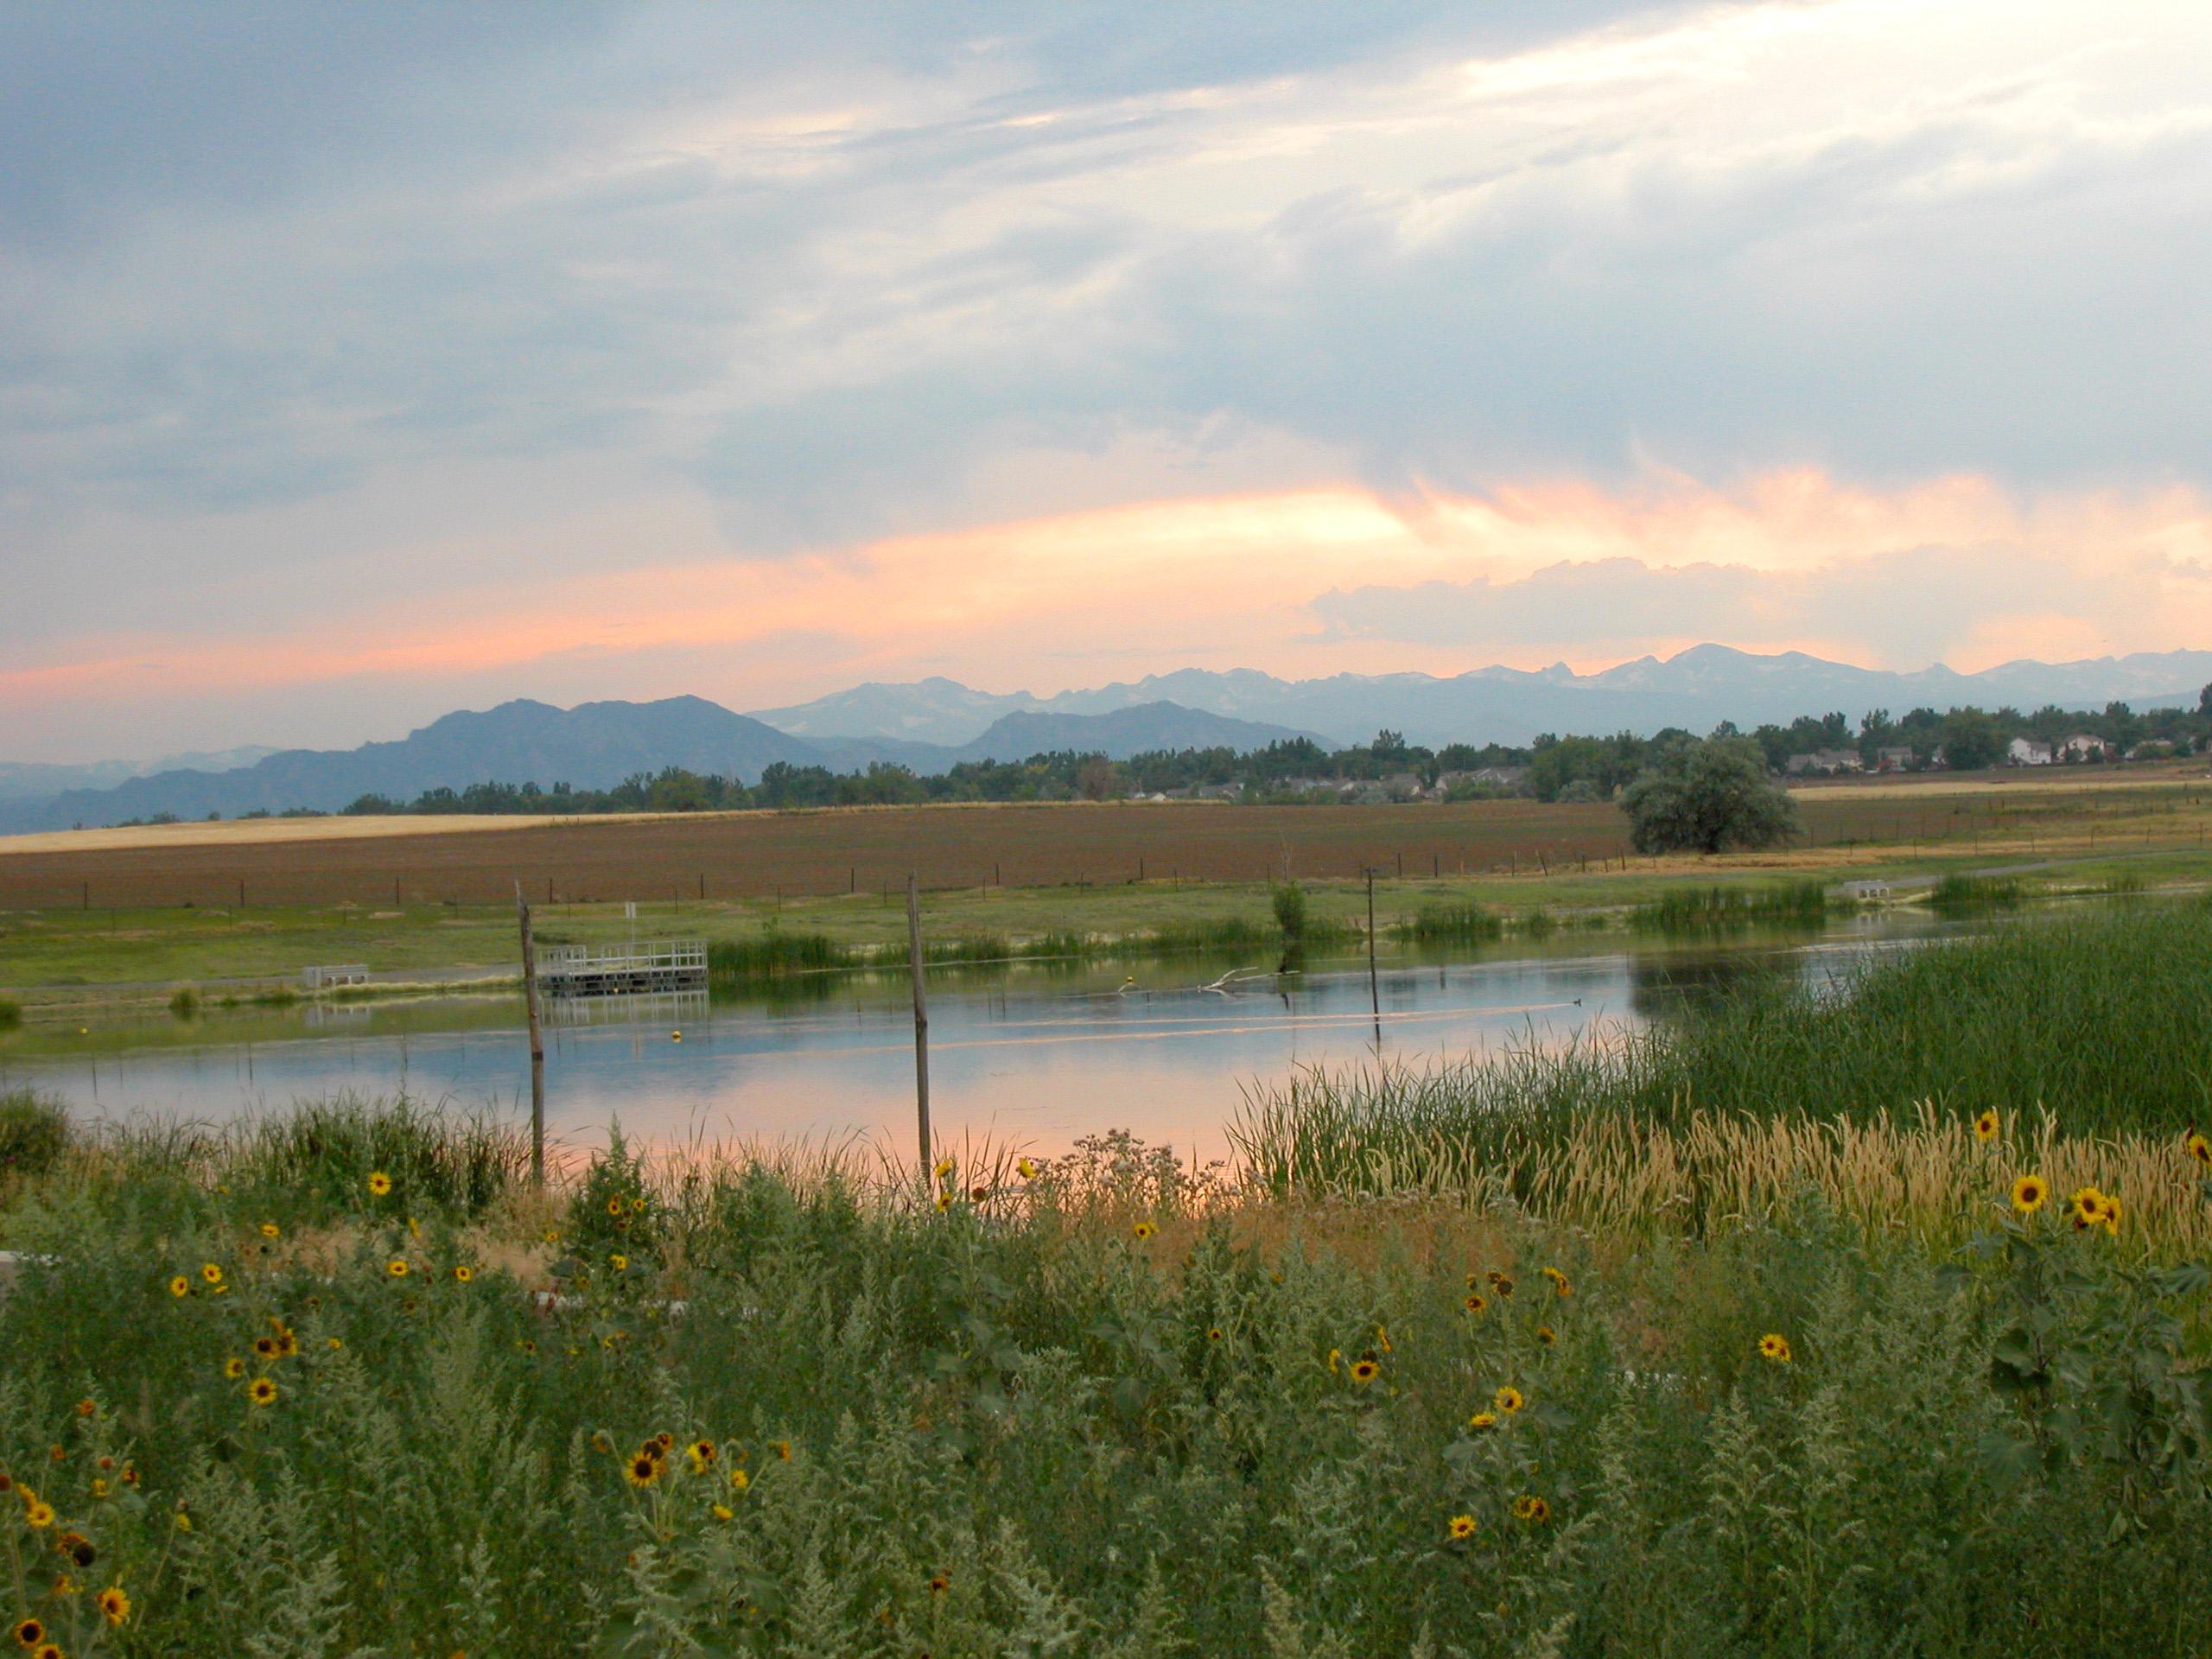 Sunset at Tom Frost Reservoir